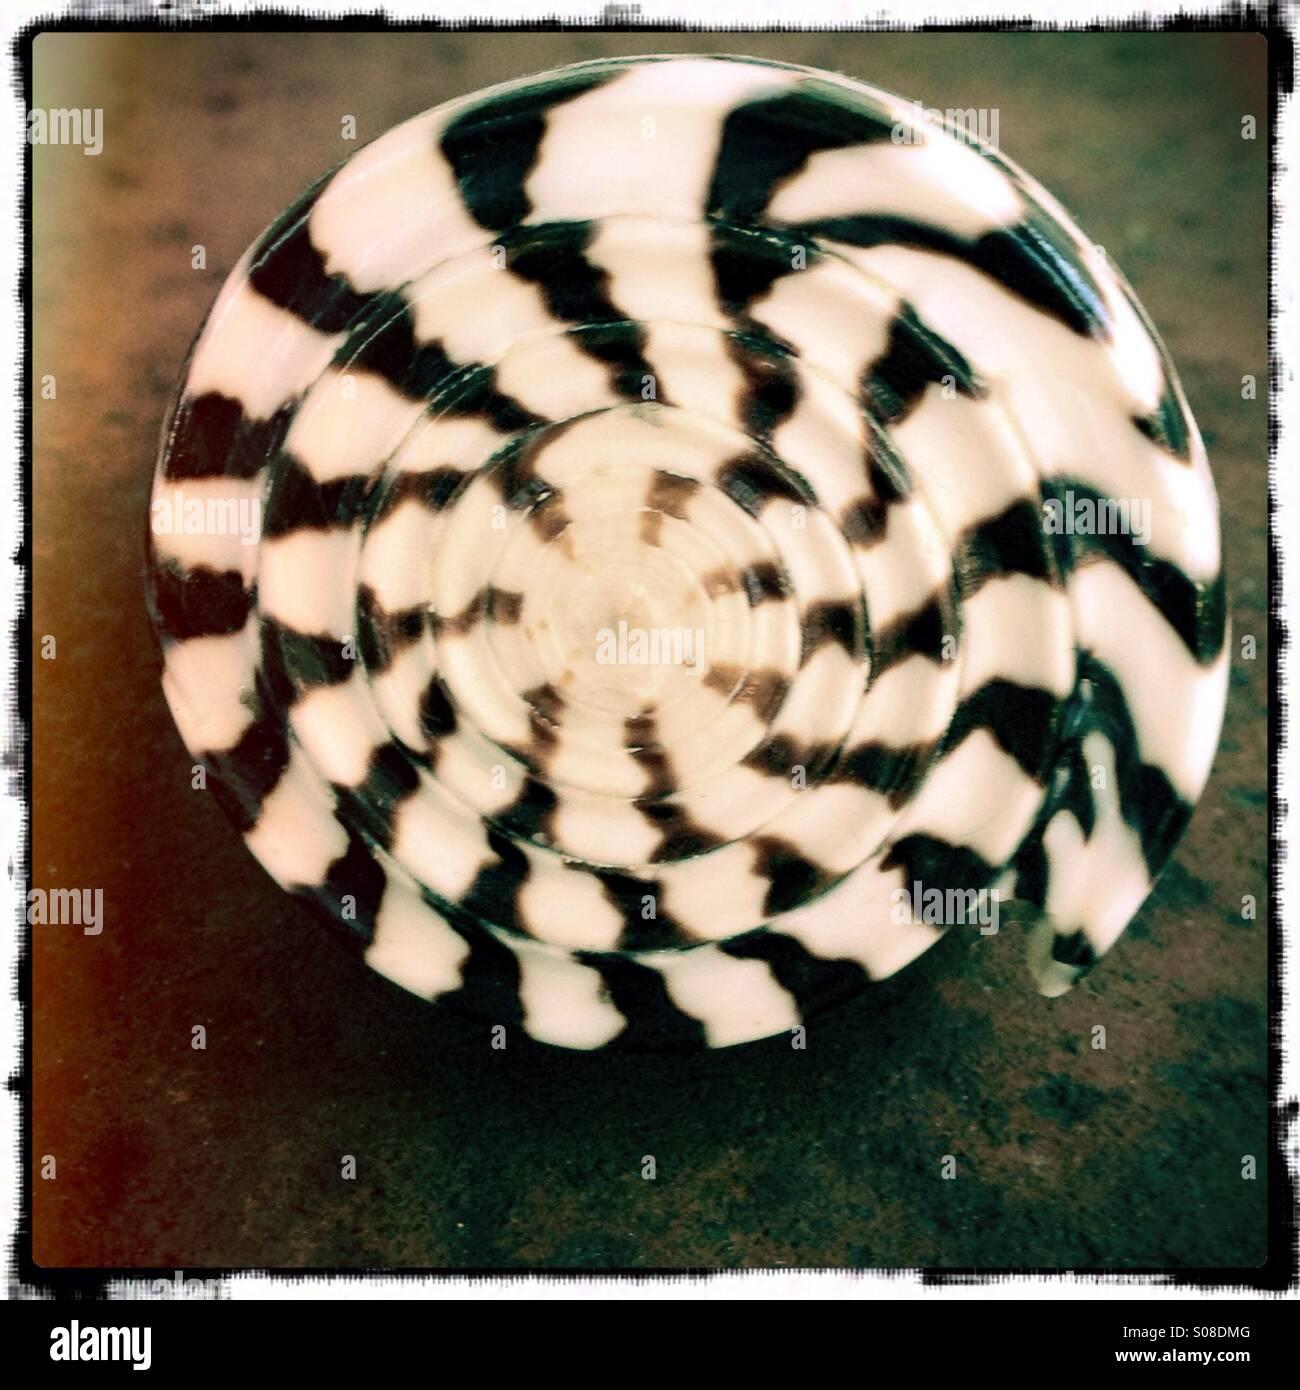 A black and white striped seashell stock photo 309973008 alamy